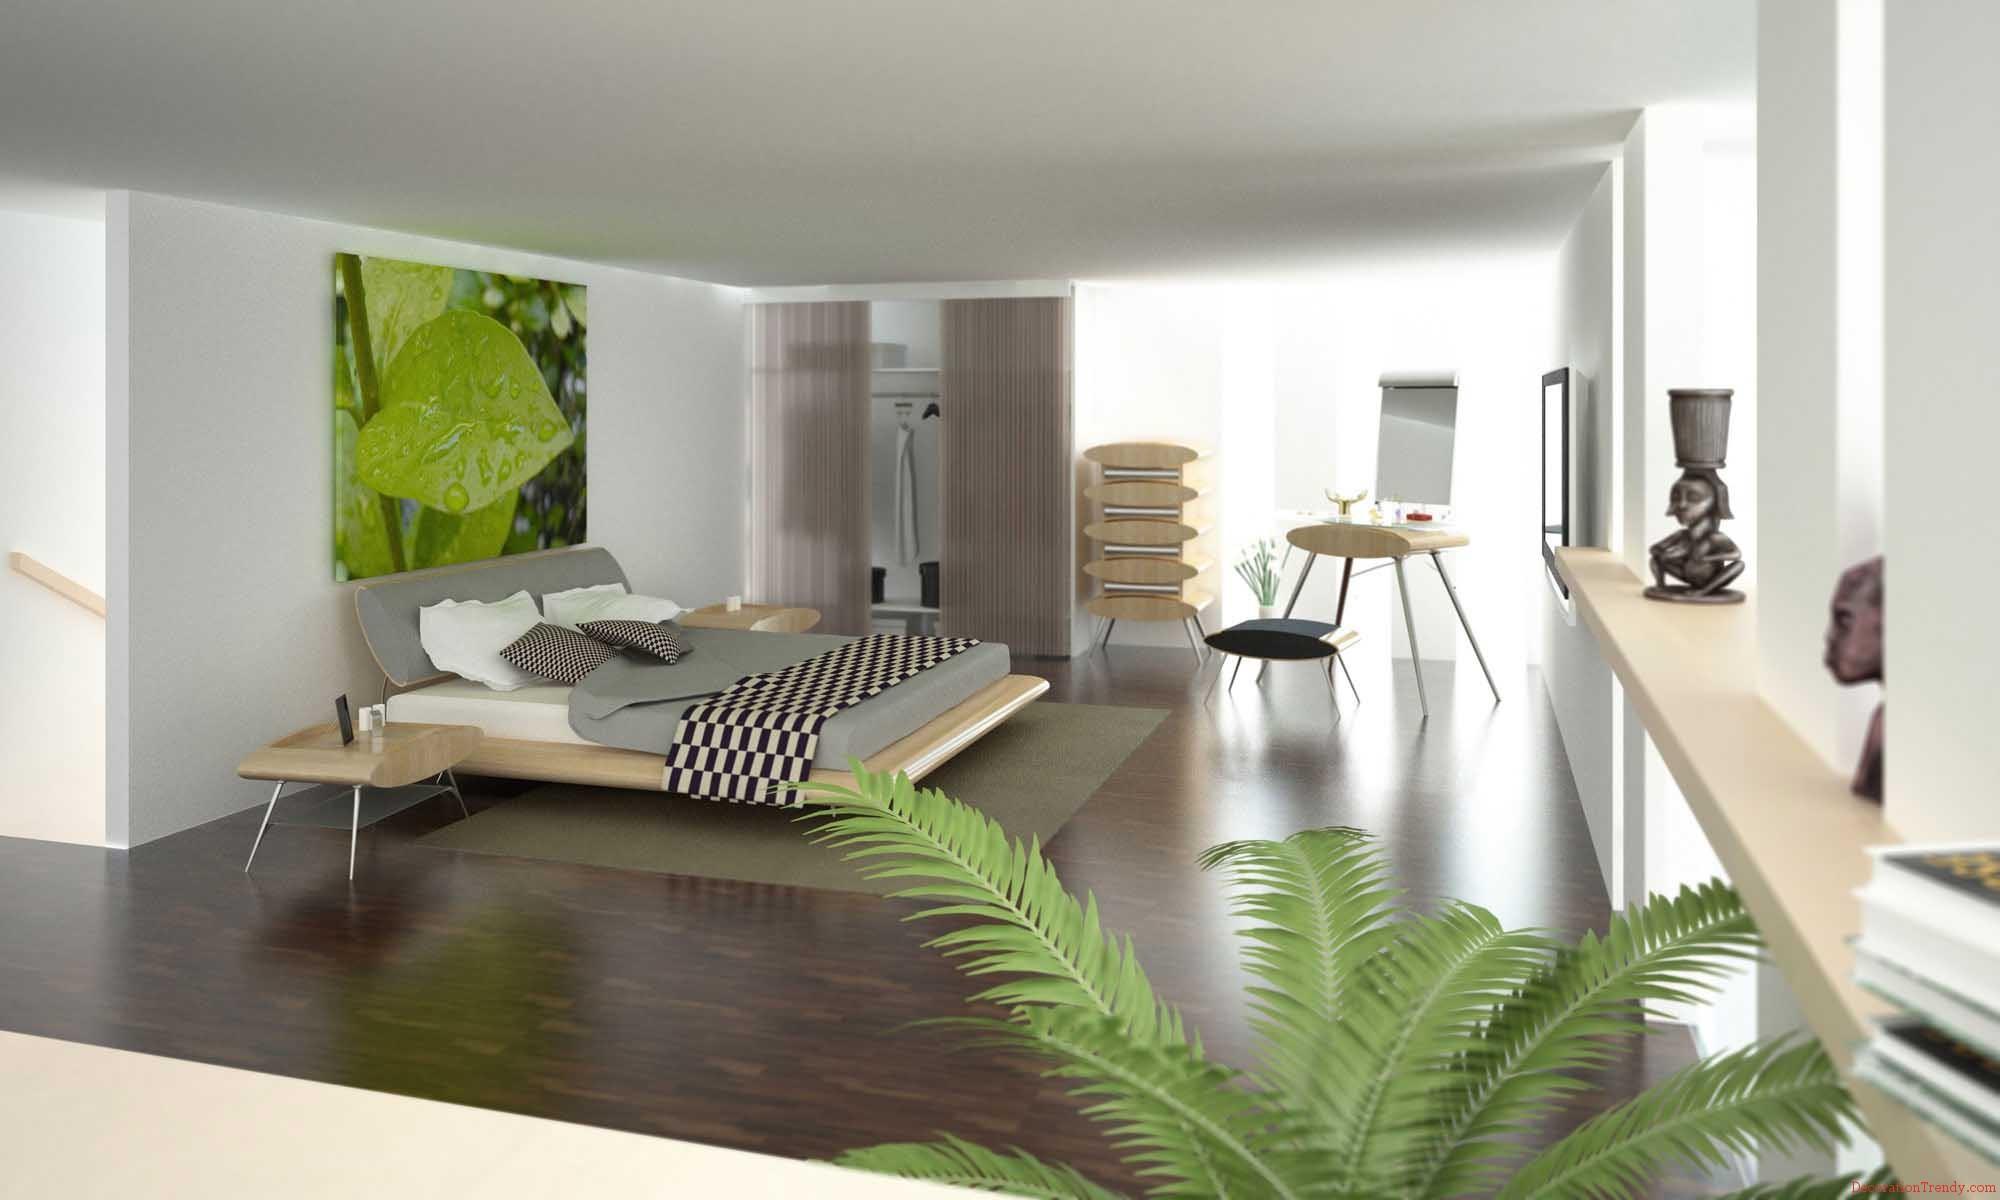 Modern Home Design Accessories photo - 5